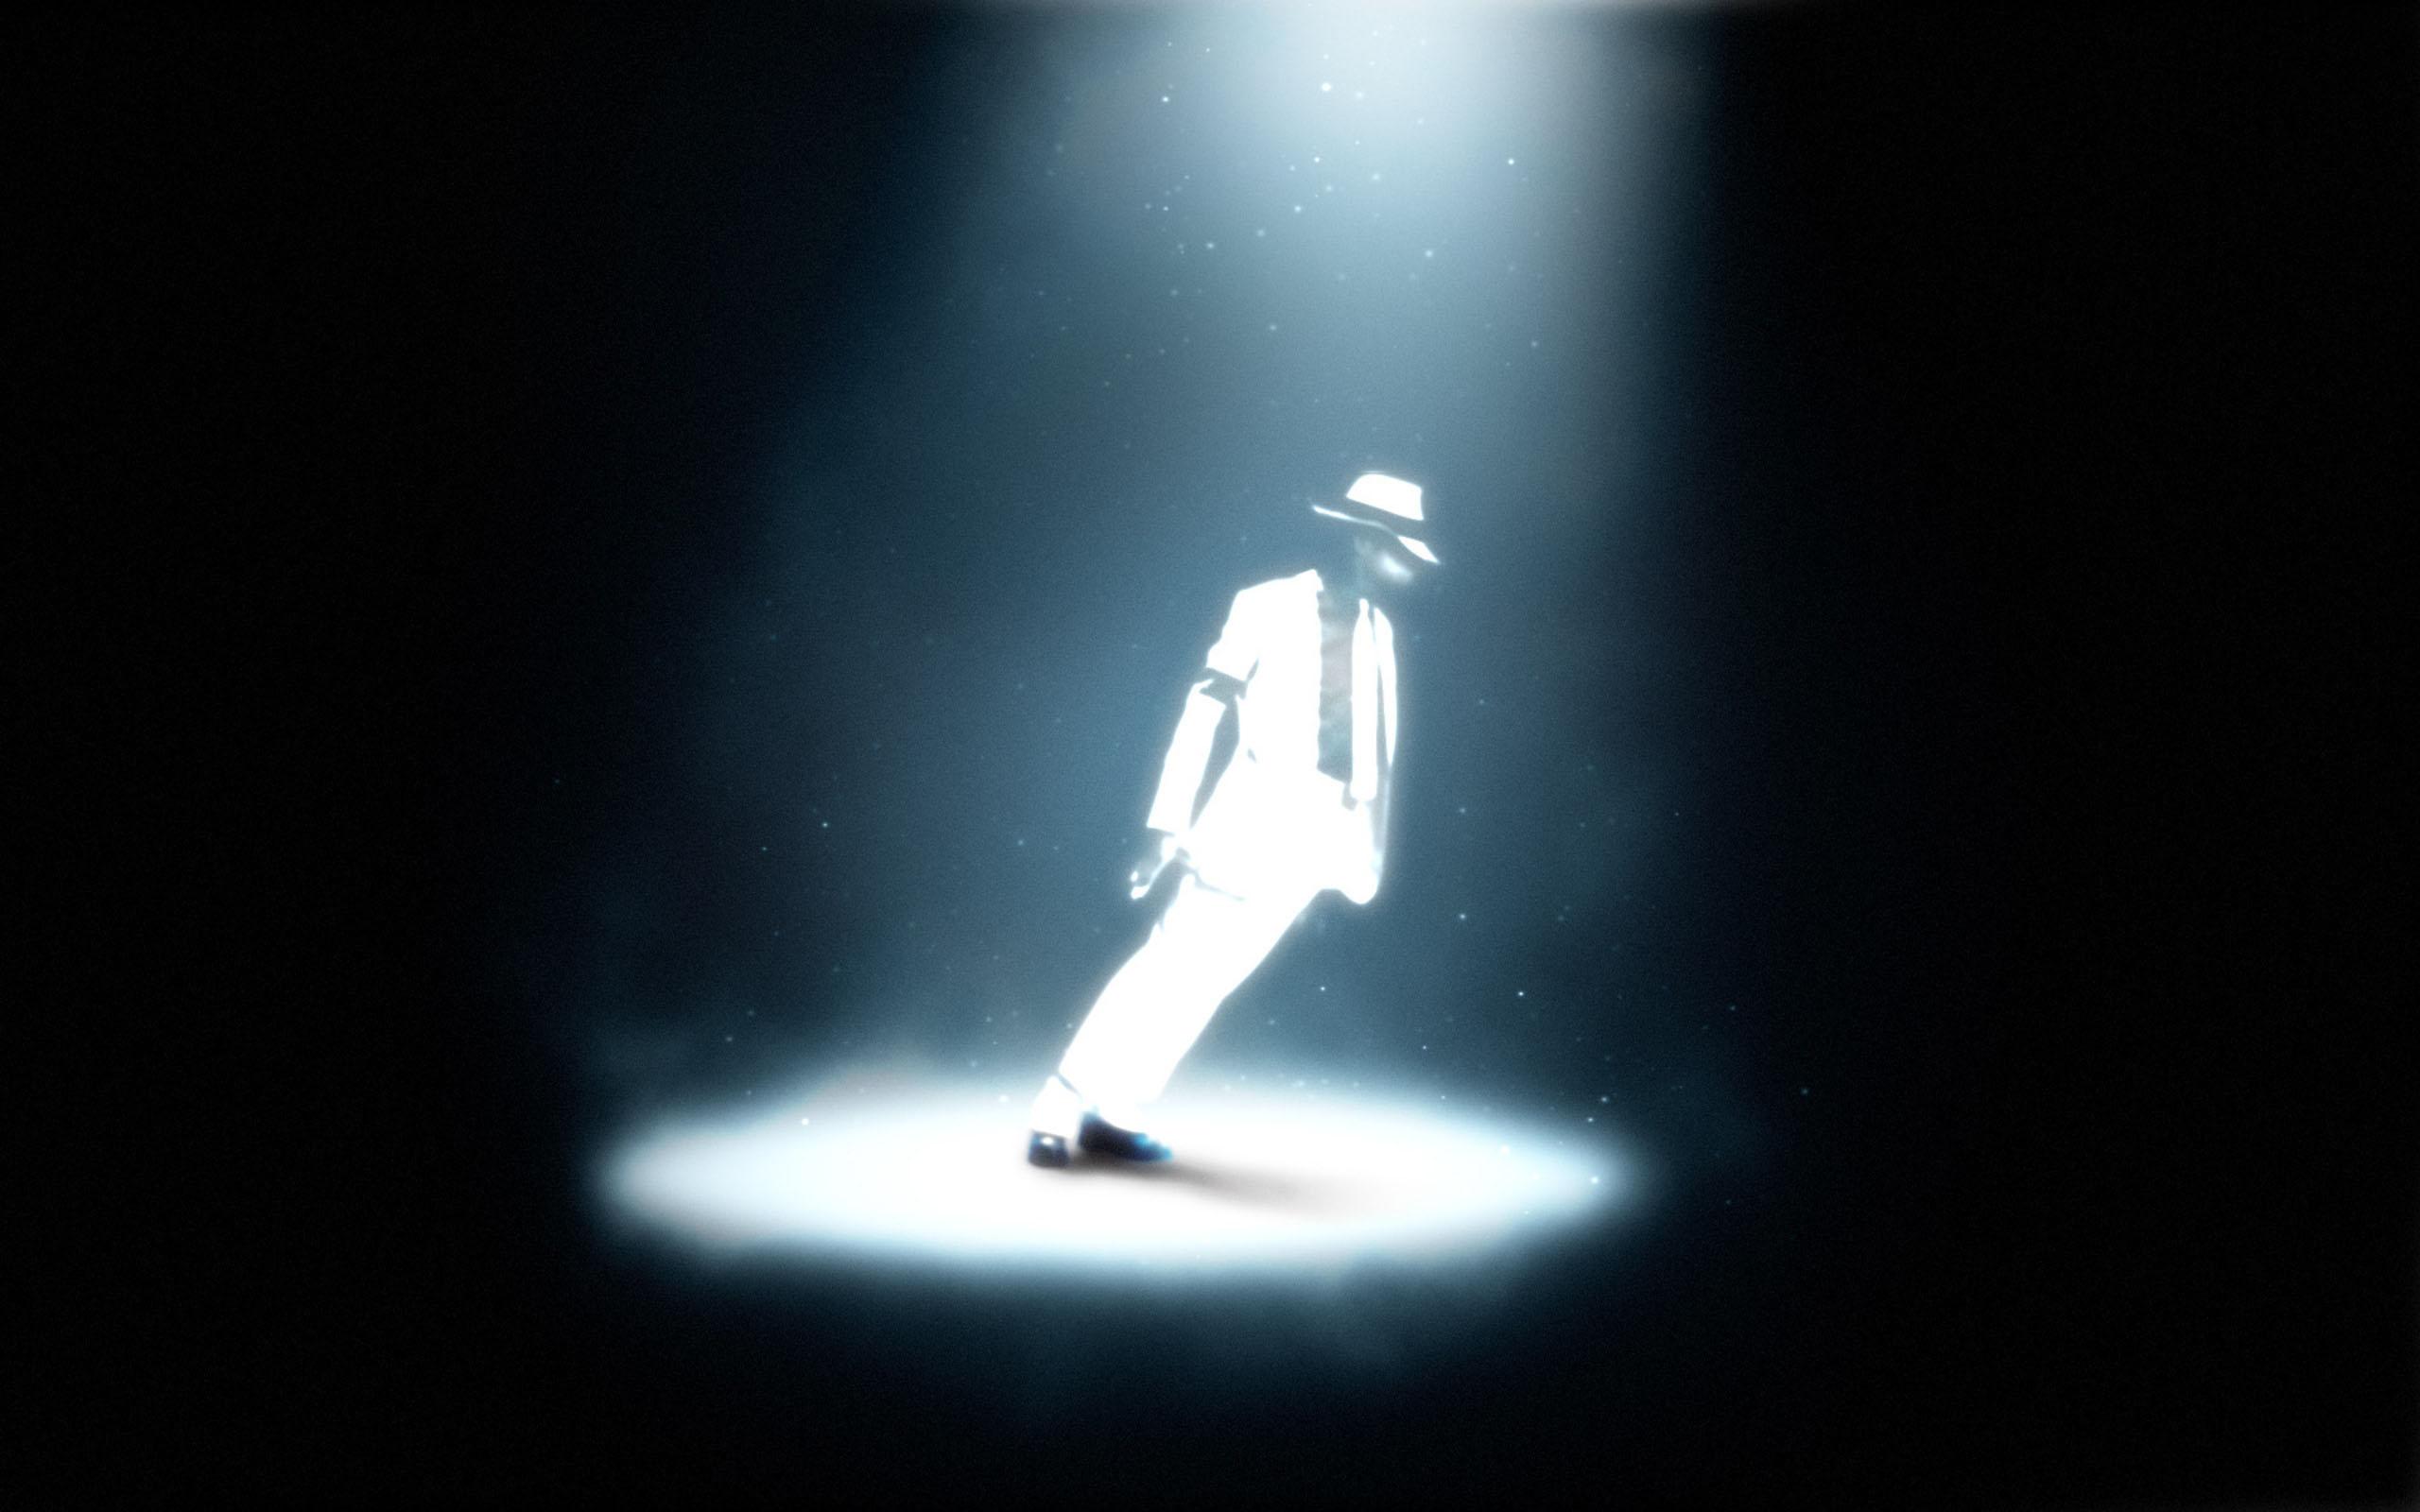 Fall Hd Wallpaper For Mac Free Hd Michael Jackson Wallpapers Pixelstalk Net